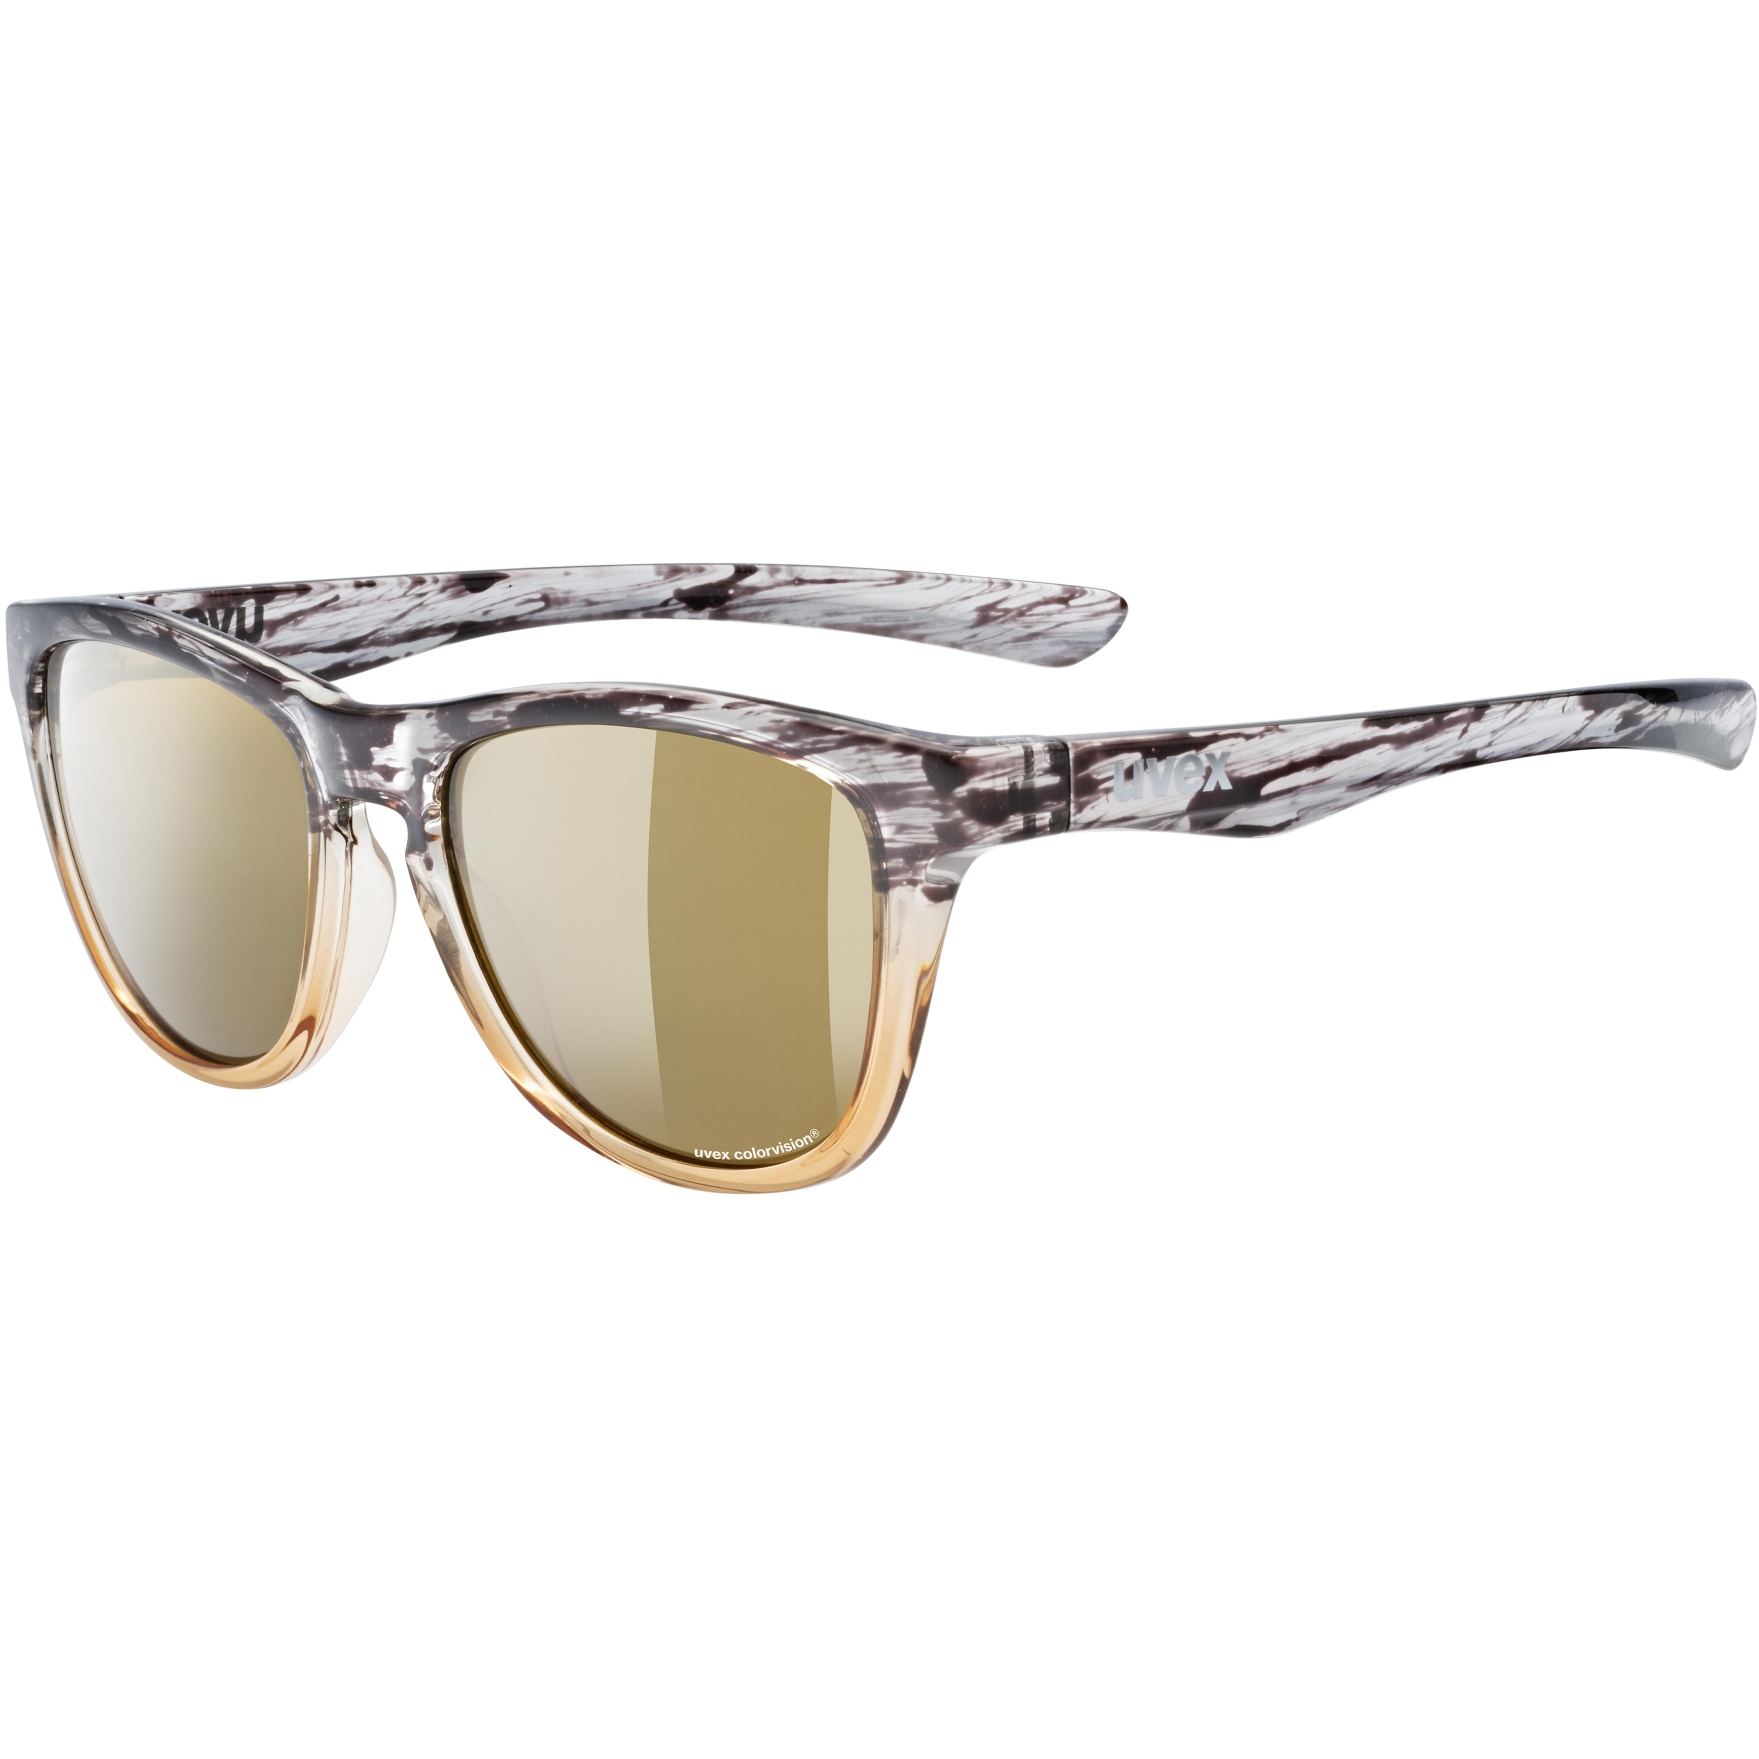 Uvex lgl 48 CV Glasses - flecked amber/colorvision mirror champagne